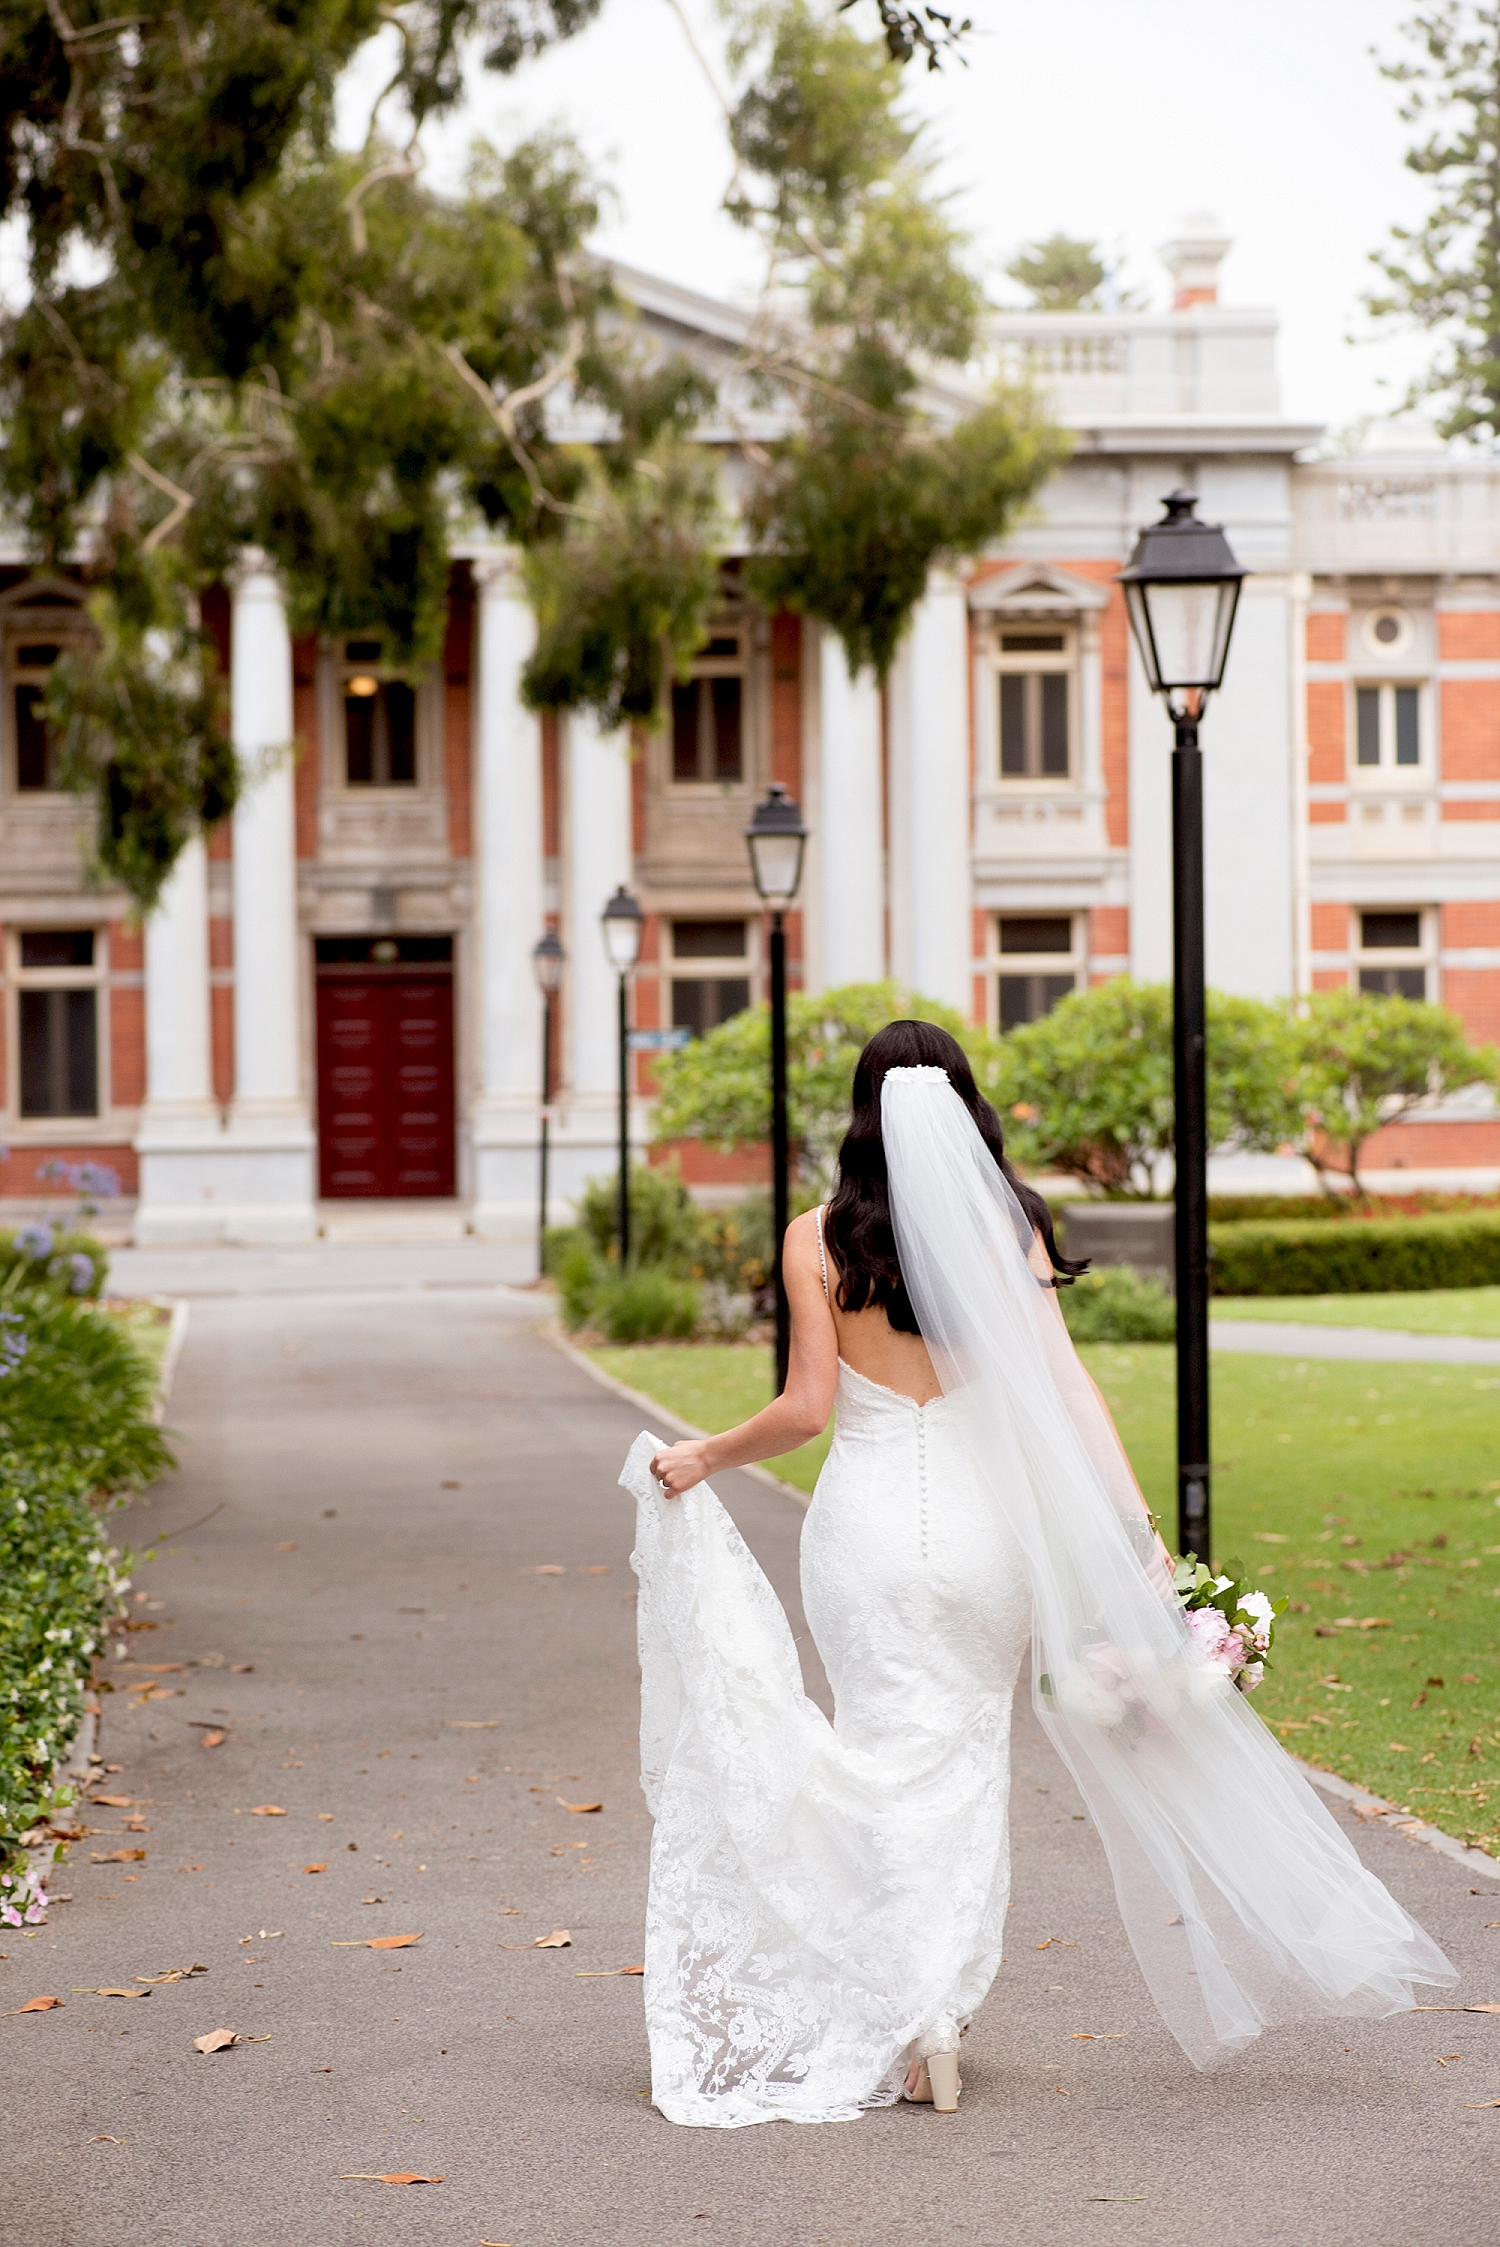 45_Perth wedding Supreme Court building.jpg